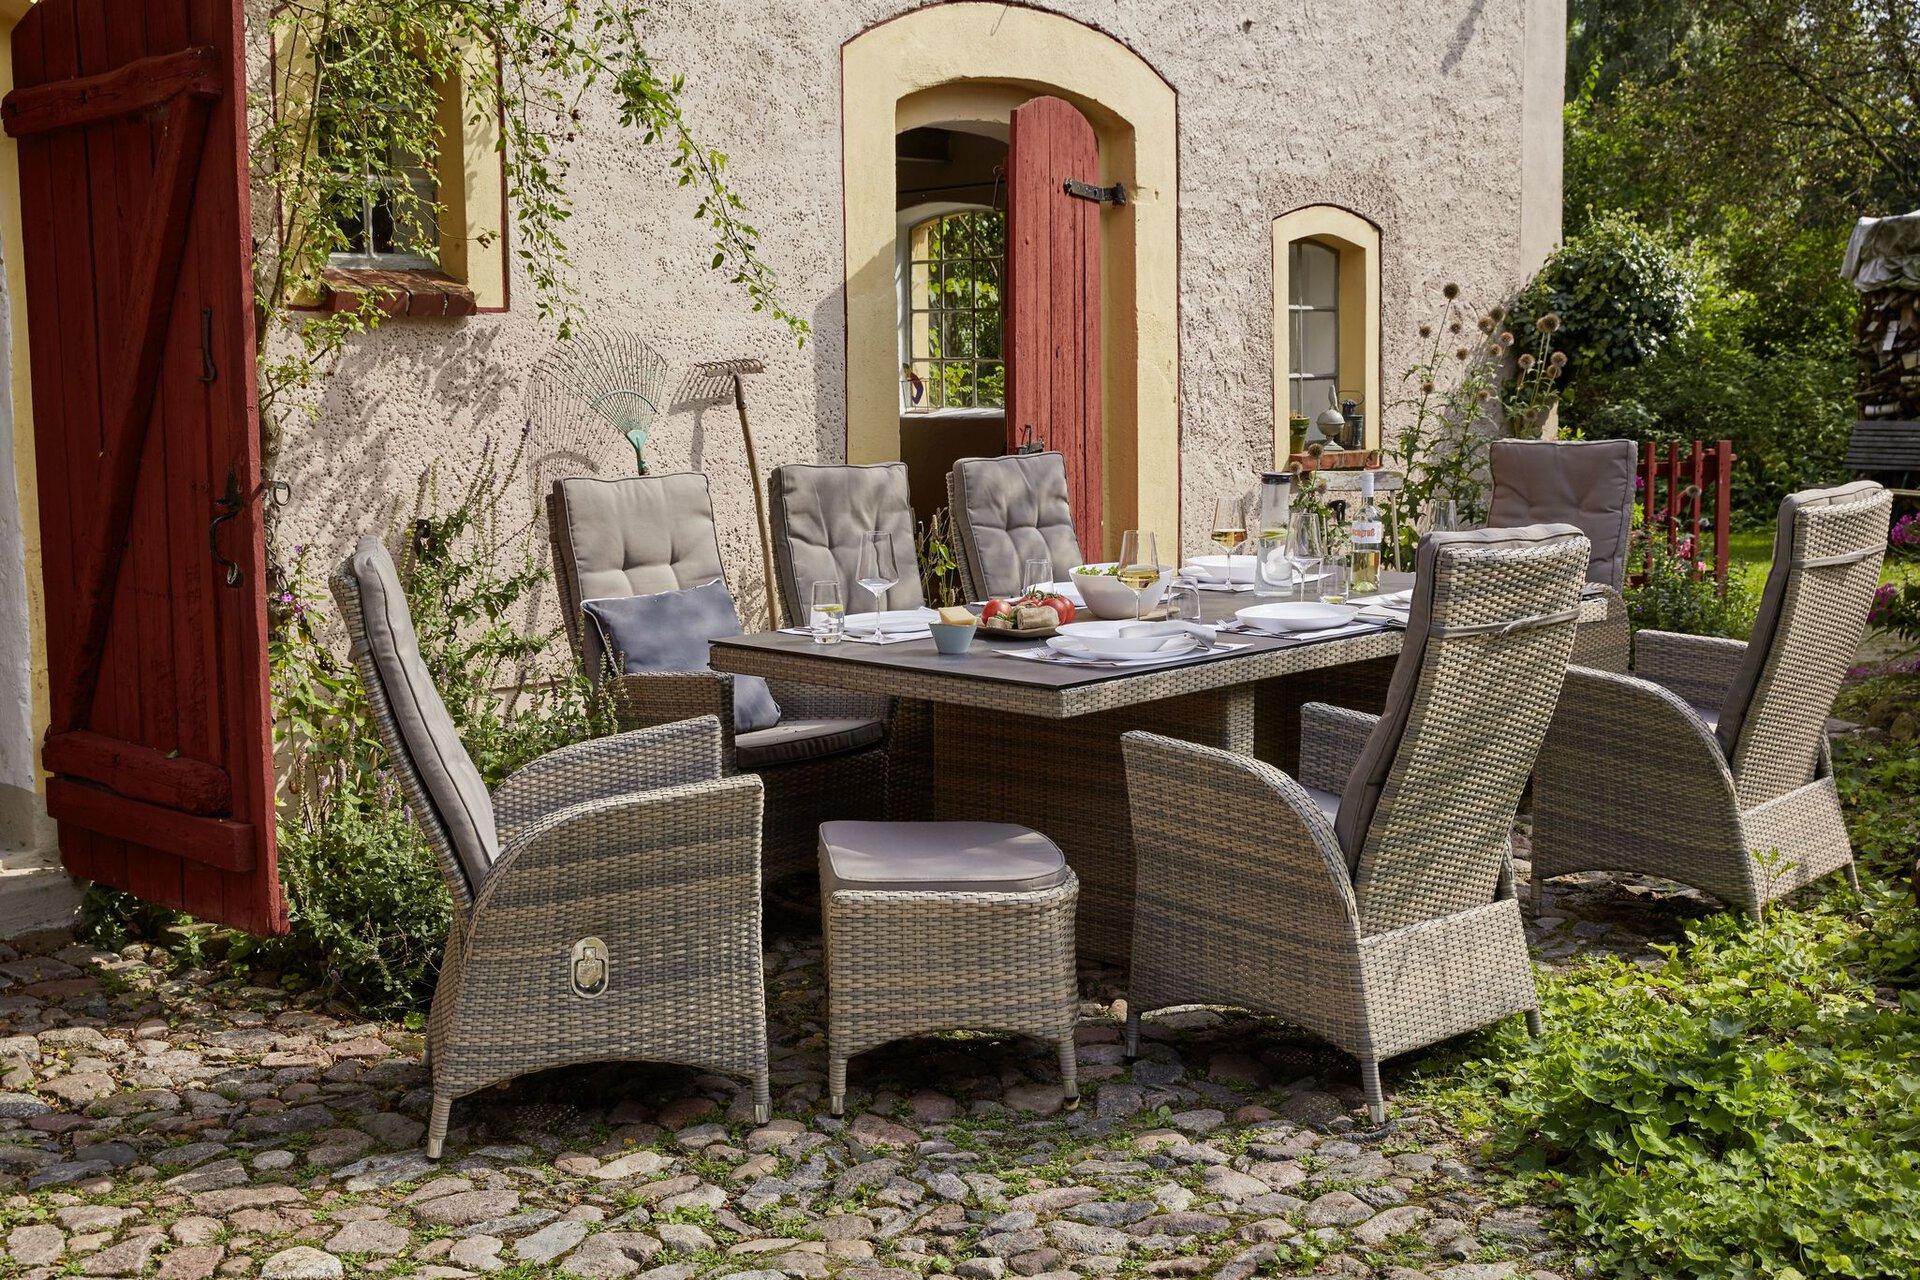 Gartenstuhl DR148204 / Derry Furniture Outdoor Textil grau 62 x 106 x 59 cm